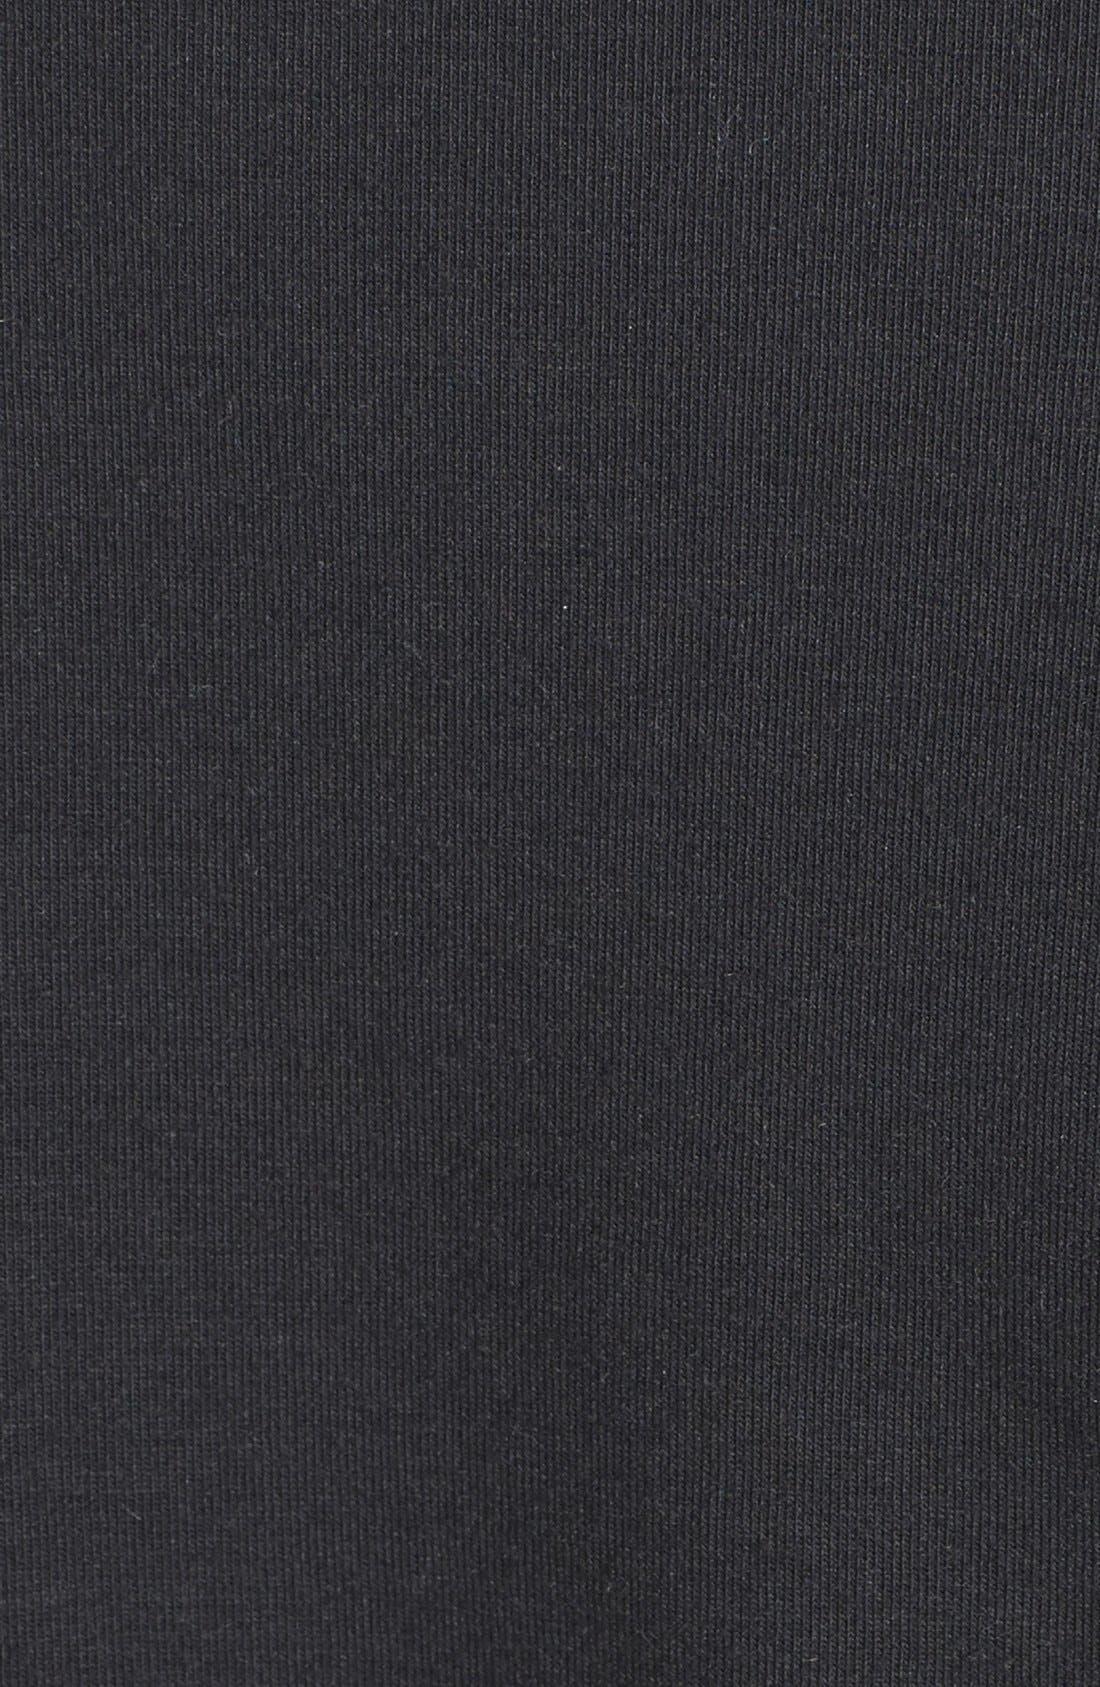 Alternate Image 4  - Zella 'Z 6' Long Sleeve Tee